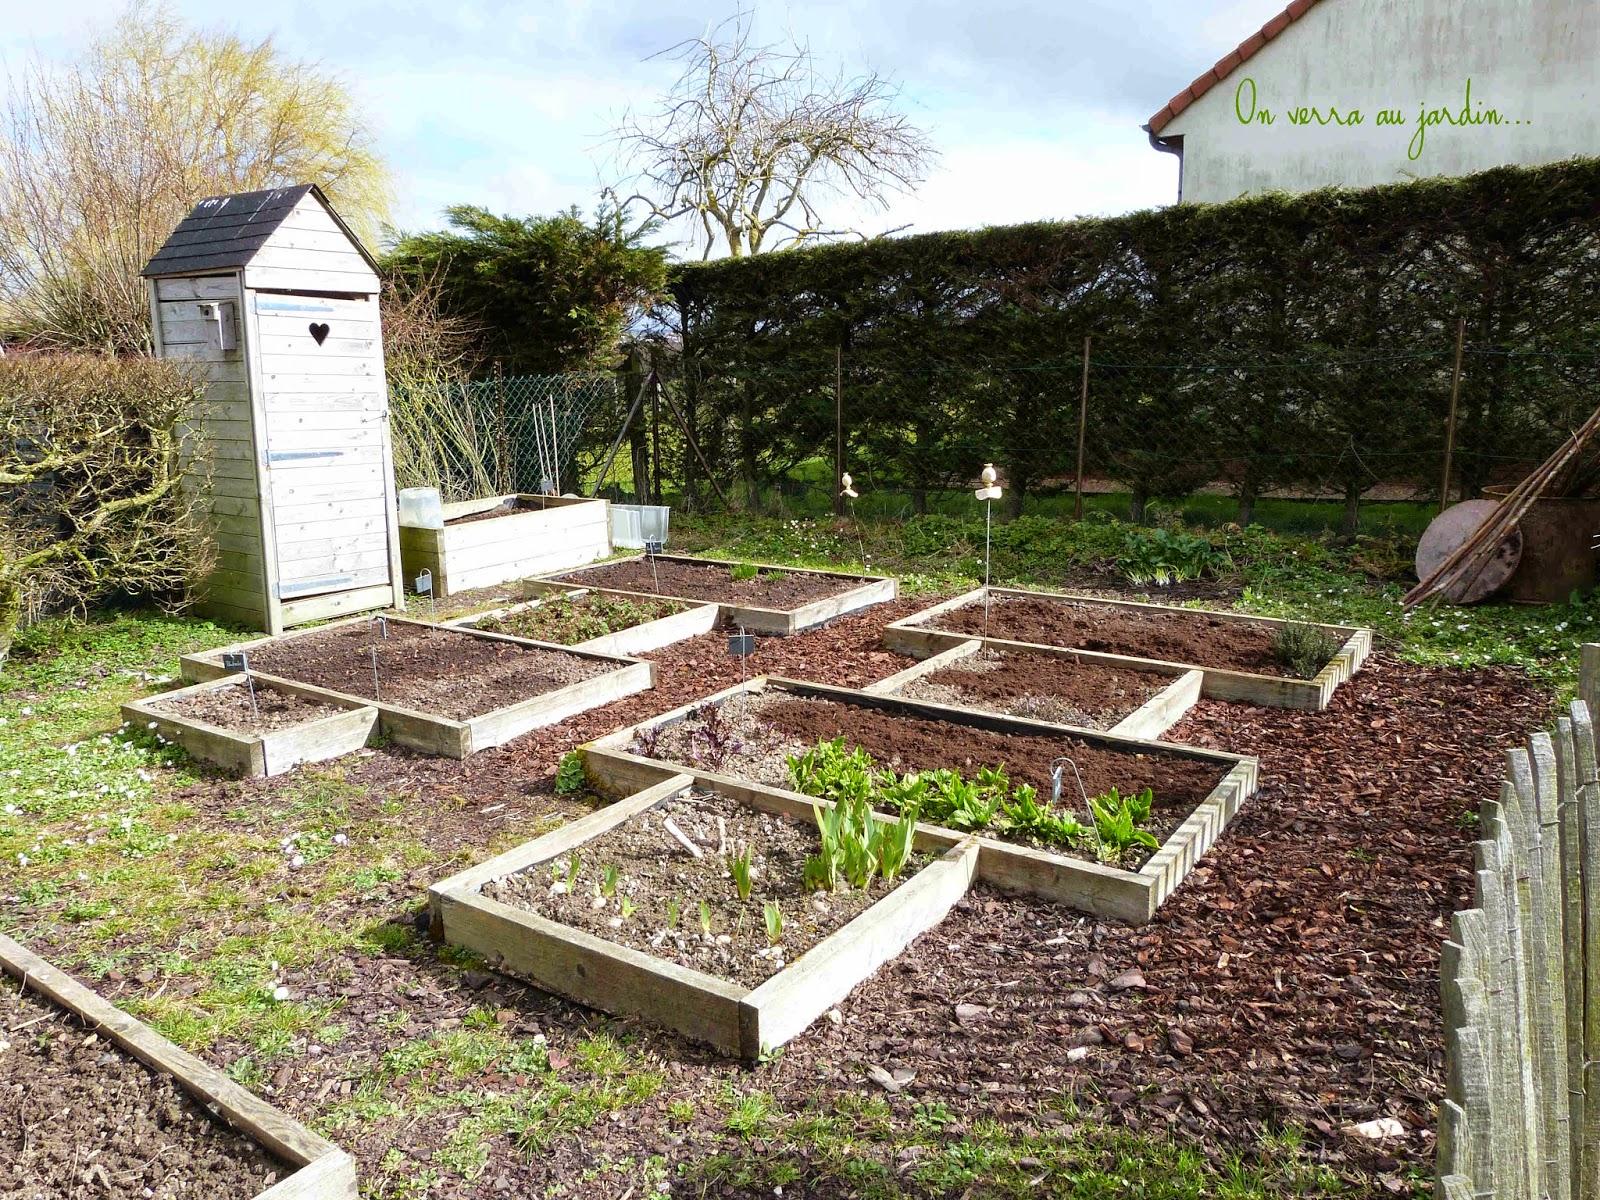 On verra au jardin potager printanier for Au jardin potager